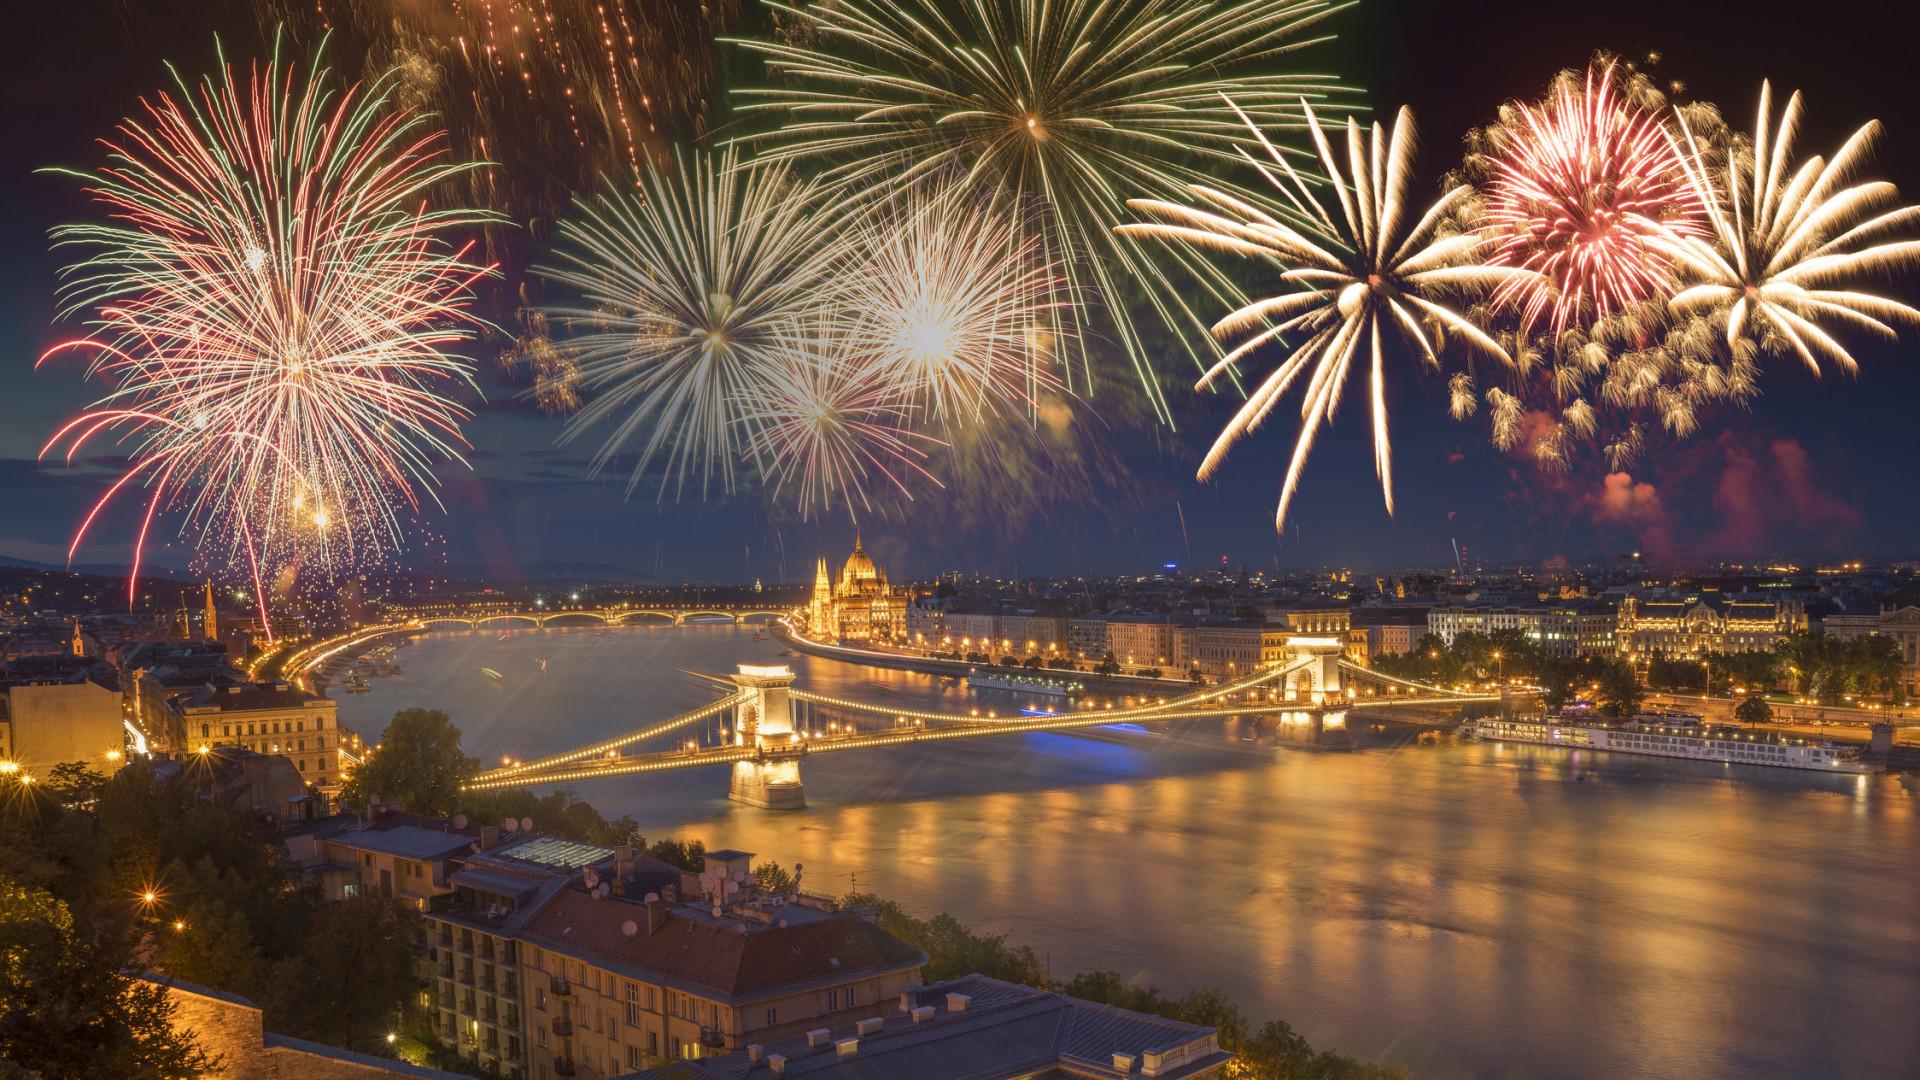 budapest-tuzijatek-410896.jpg